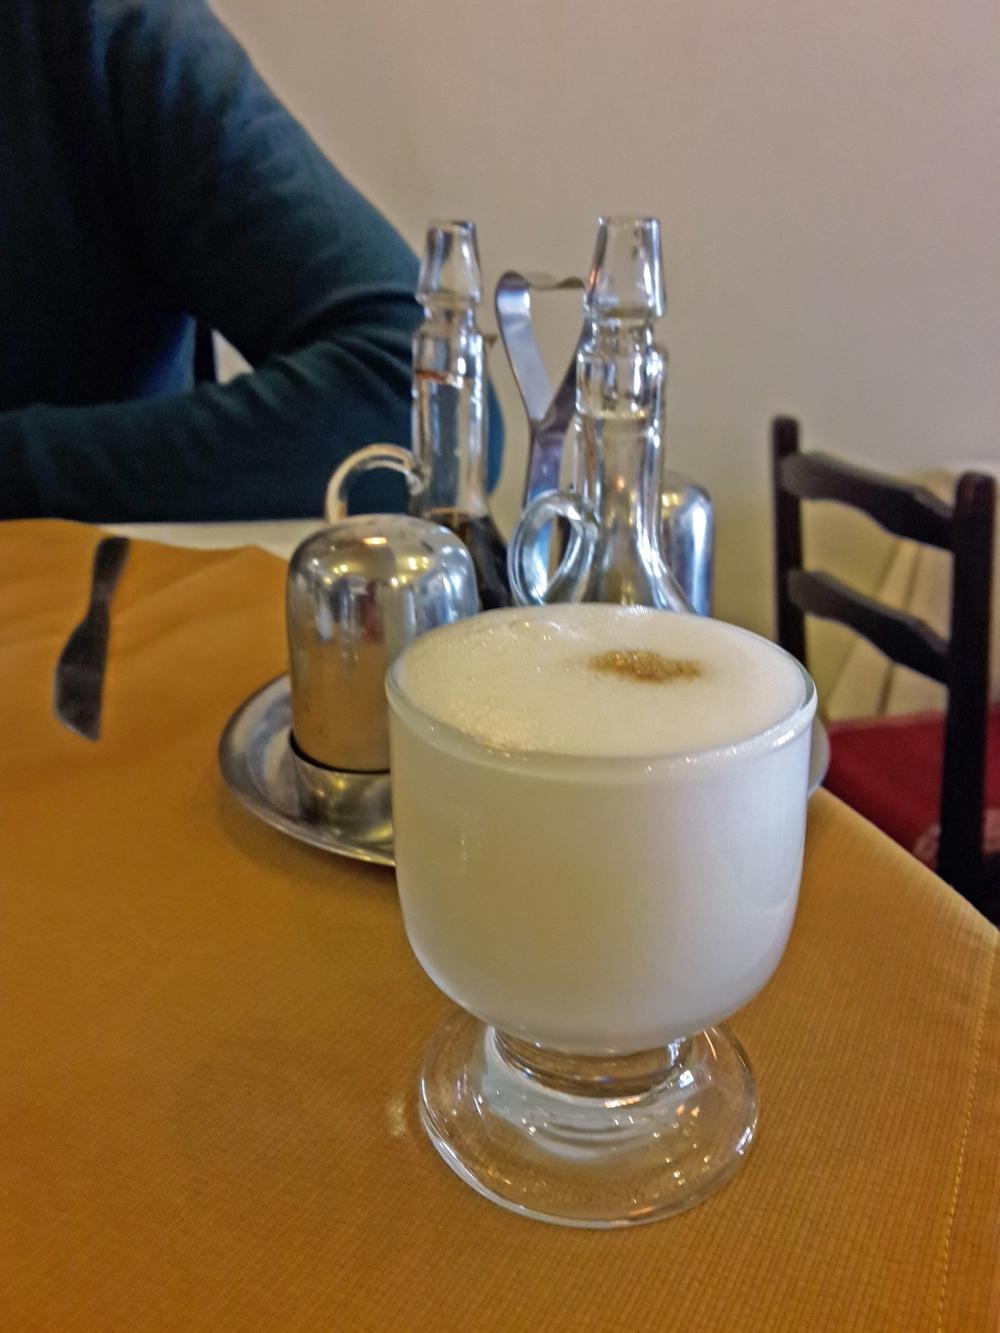 pisco sour-pisco-bevanda peruviana-acquavite-Perù-Sud America